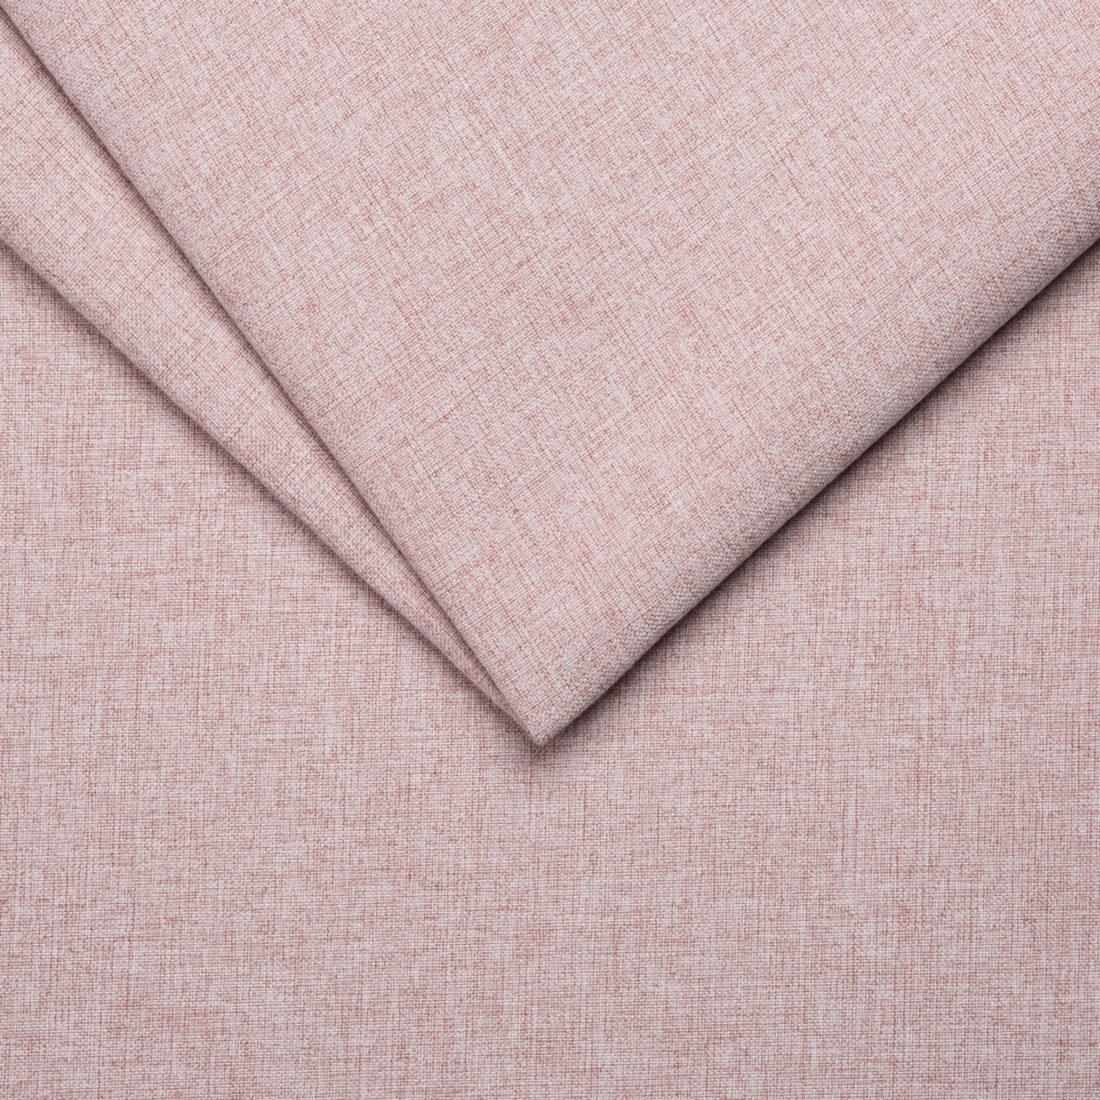 Меблева тканина Cashmere 7 Flamingo, рогожка